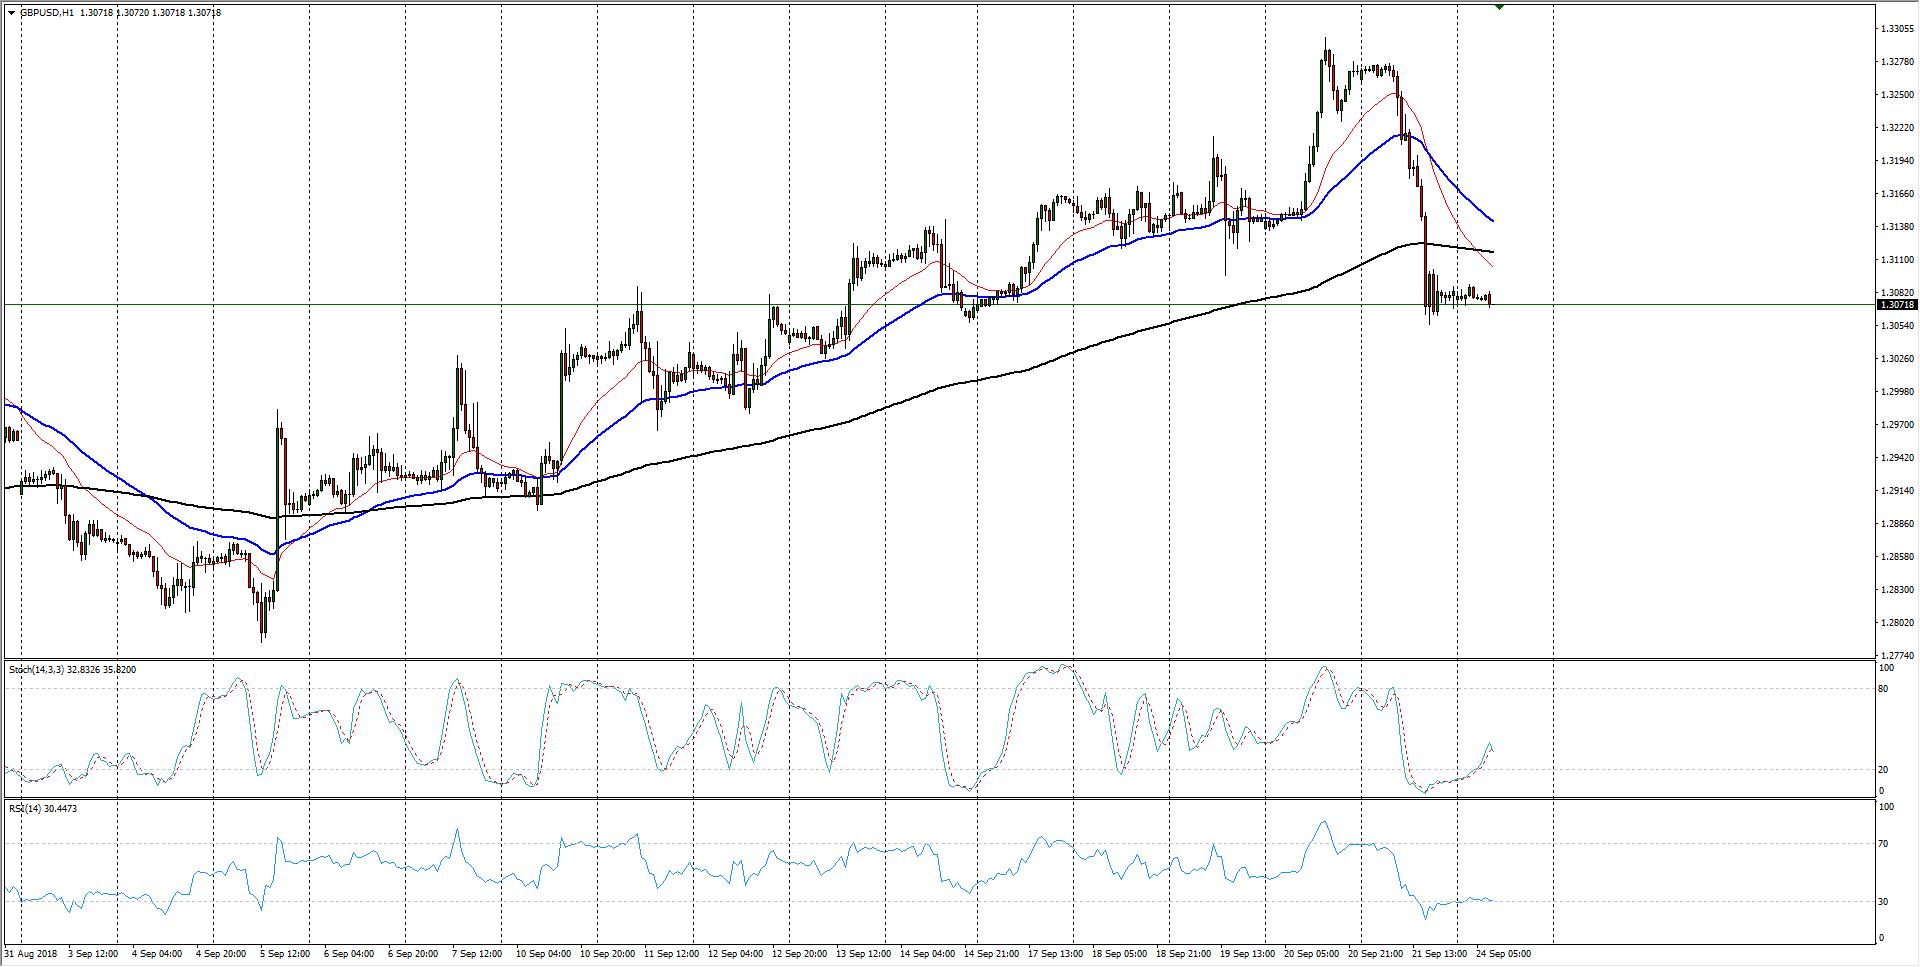 Gbp Usd Chart 1 Hour